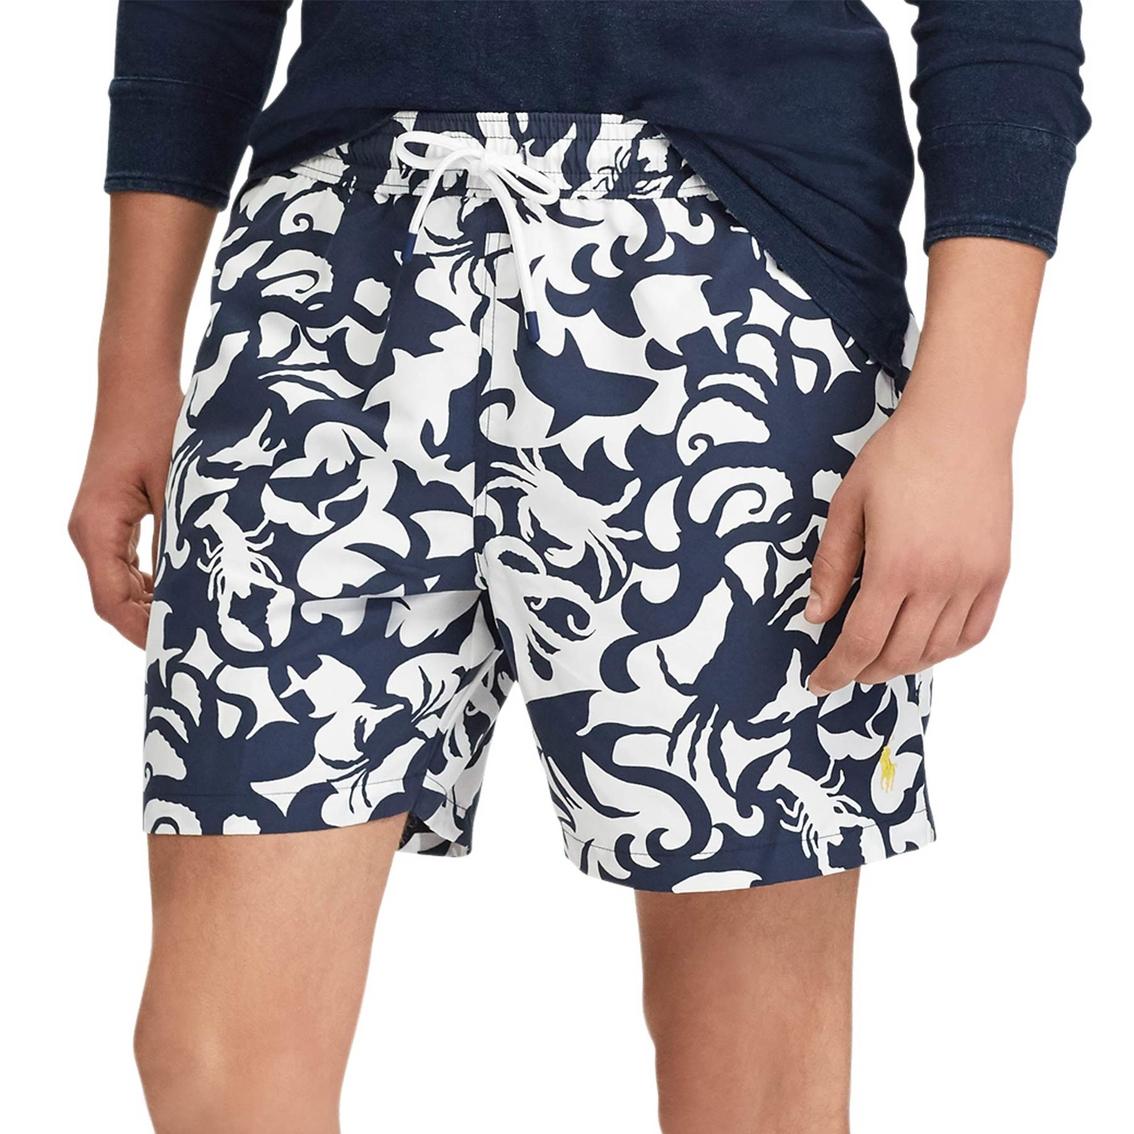 e3b6b41130657 Polo Ralph Lauren 5.75 In. Traveler Swim Trunk | Swimwear | Apparel ...